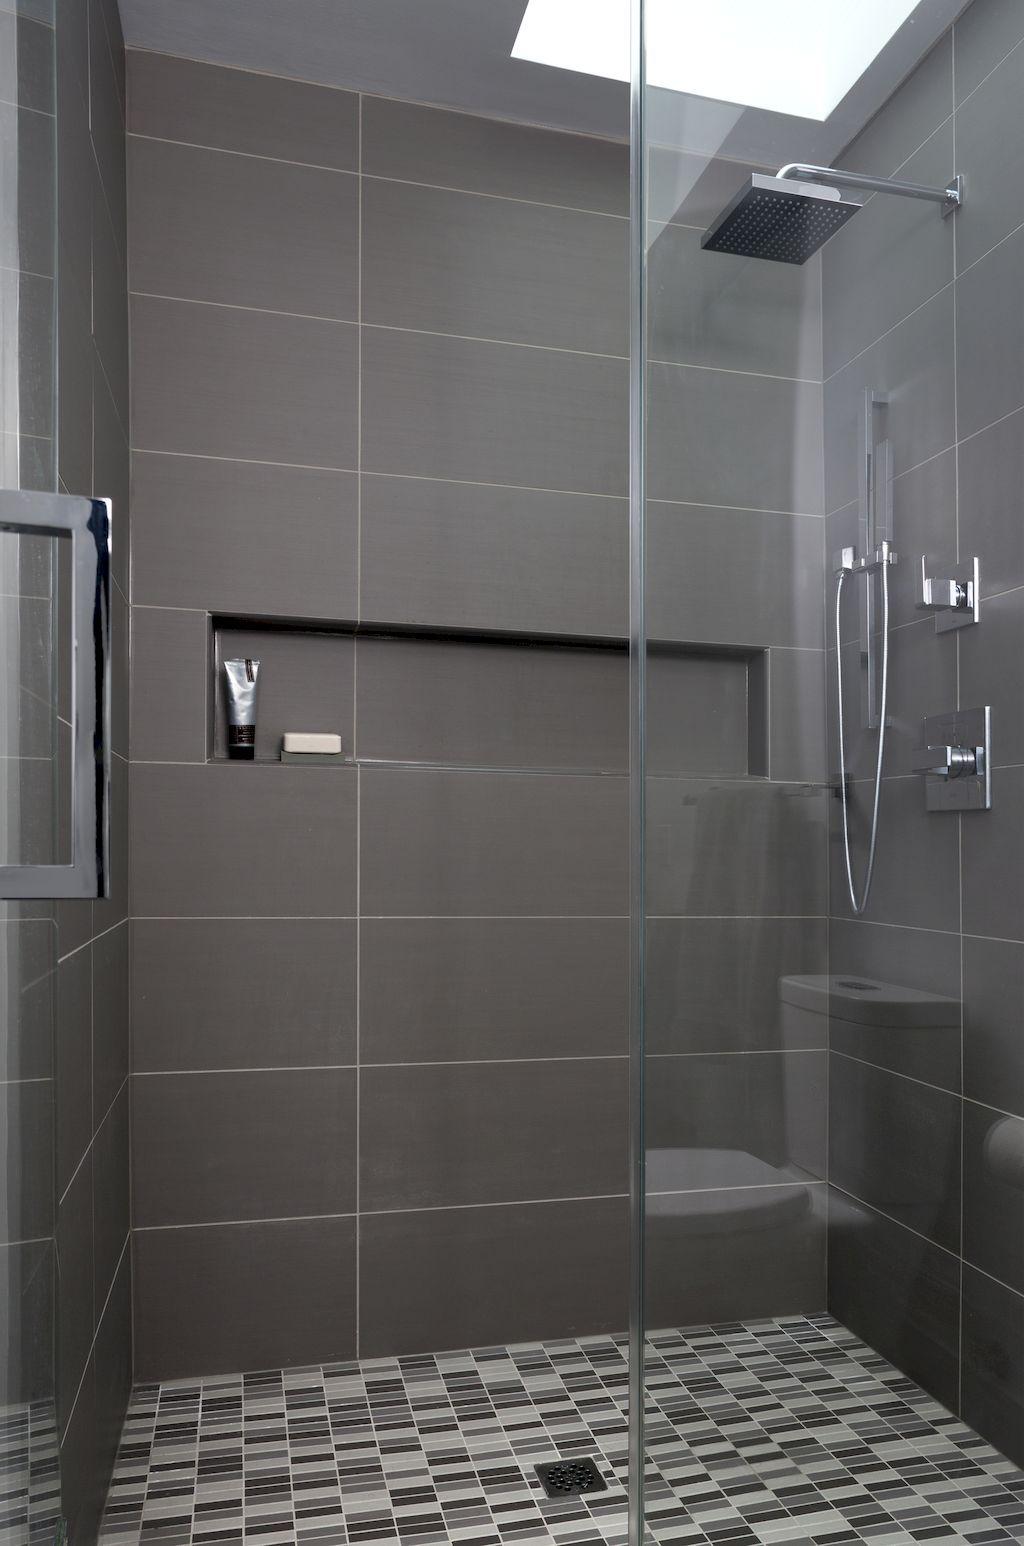 Adorable 75 Efficient Small Bathroom Remodel Design Ideas Https Roomaniac Com 75 Efficie Bathroom Design Small Modern Elegant Bathroom Small Bathroom Remodel